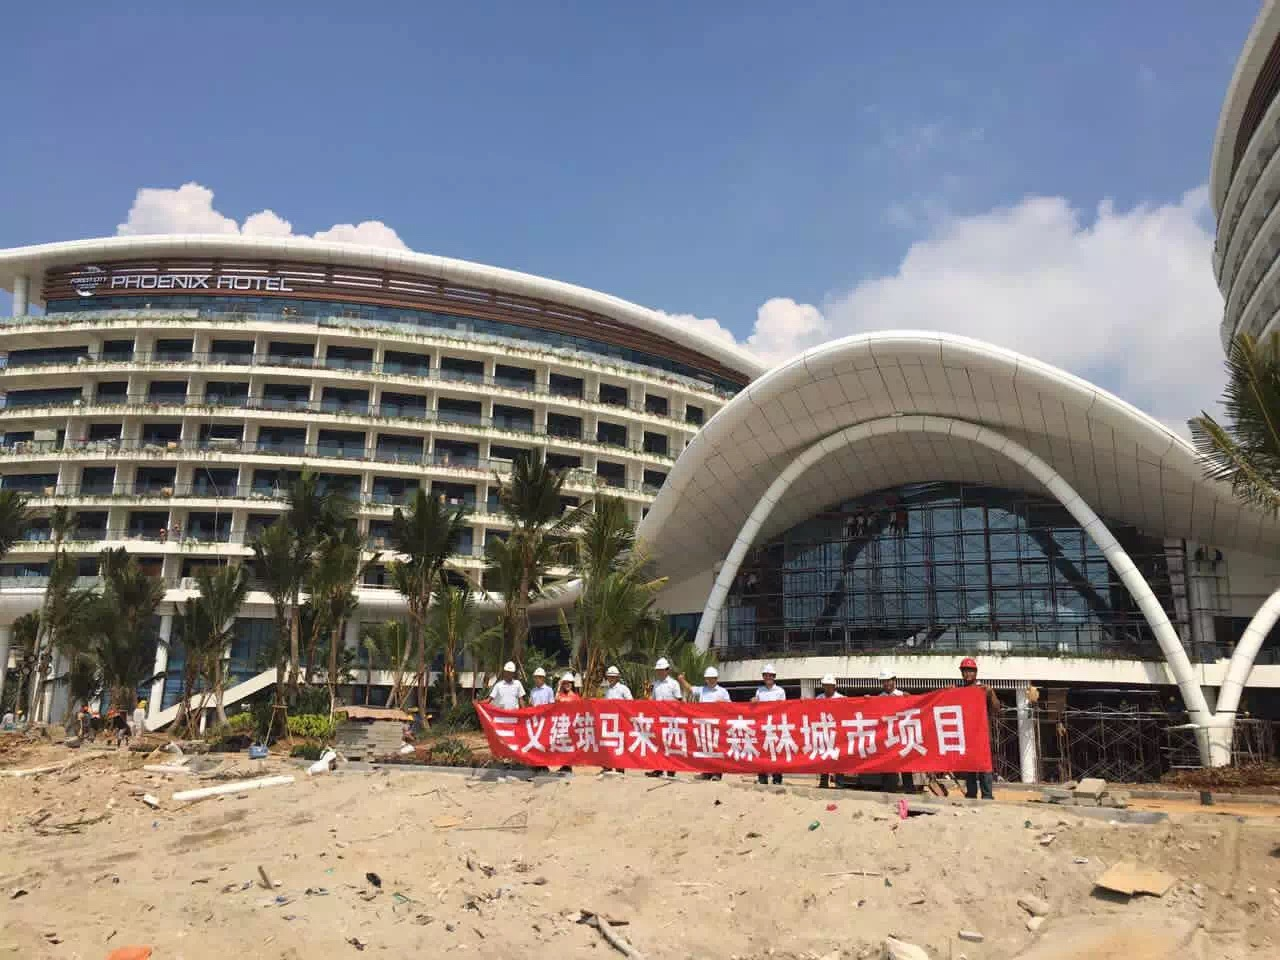 Malaysia Phoenix Hotel